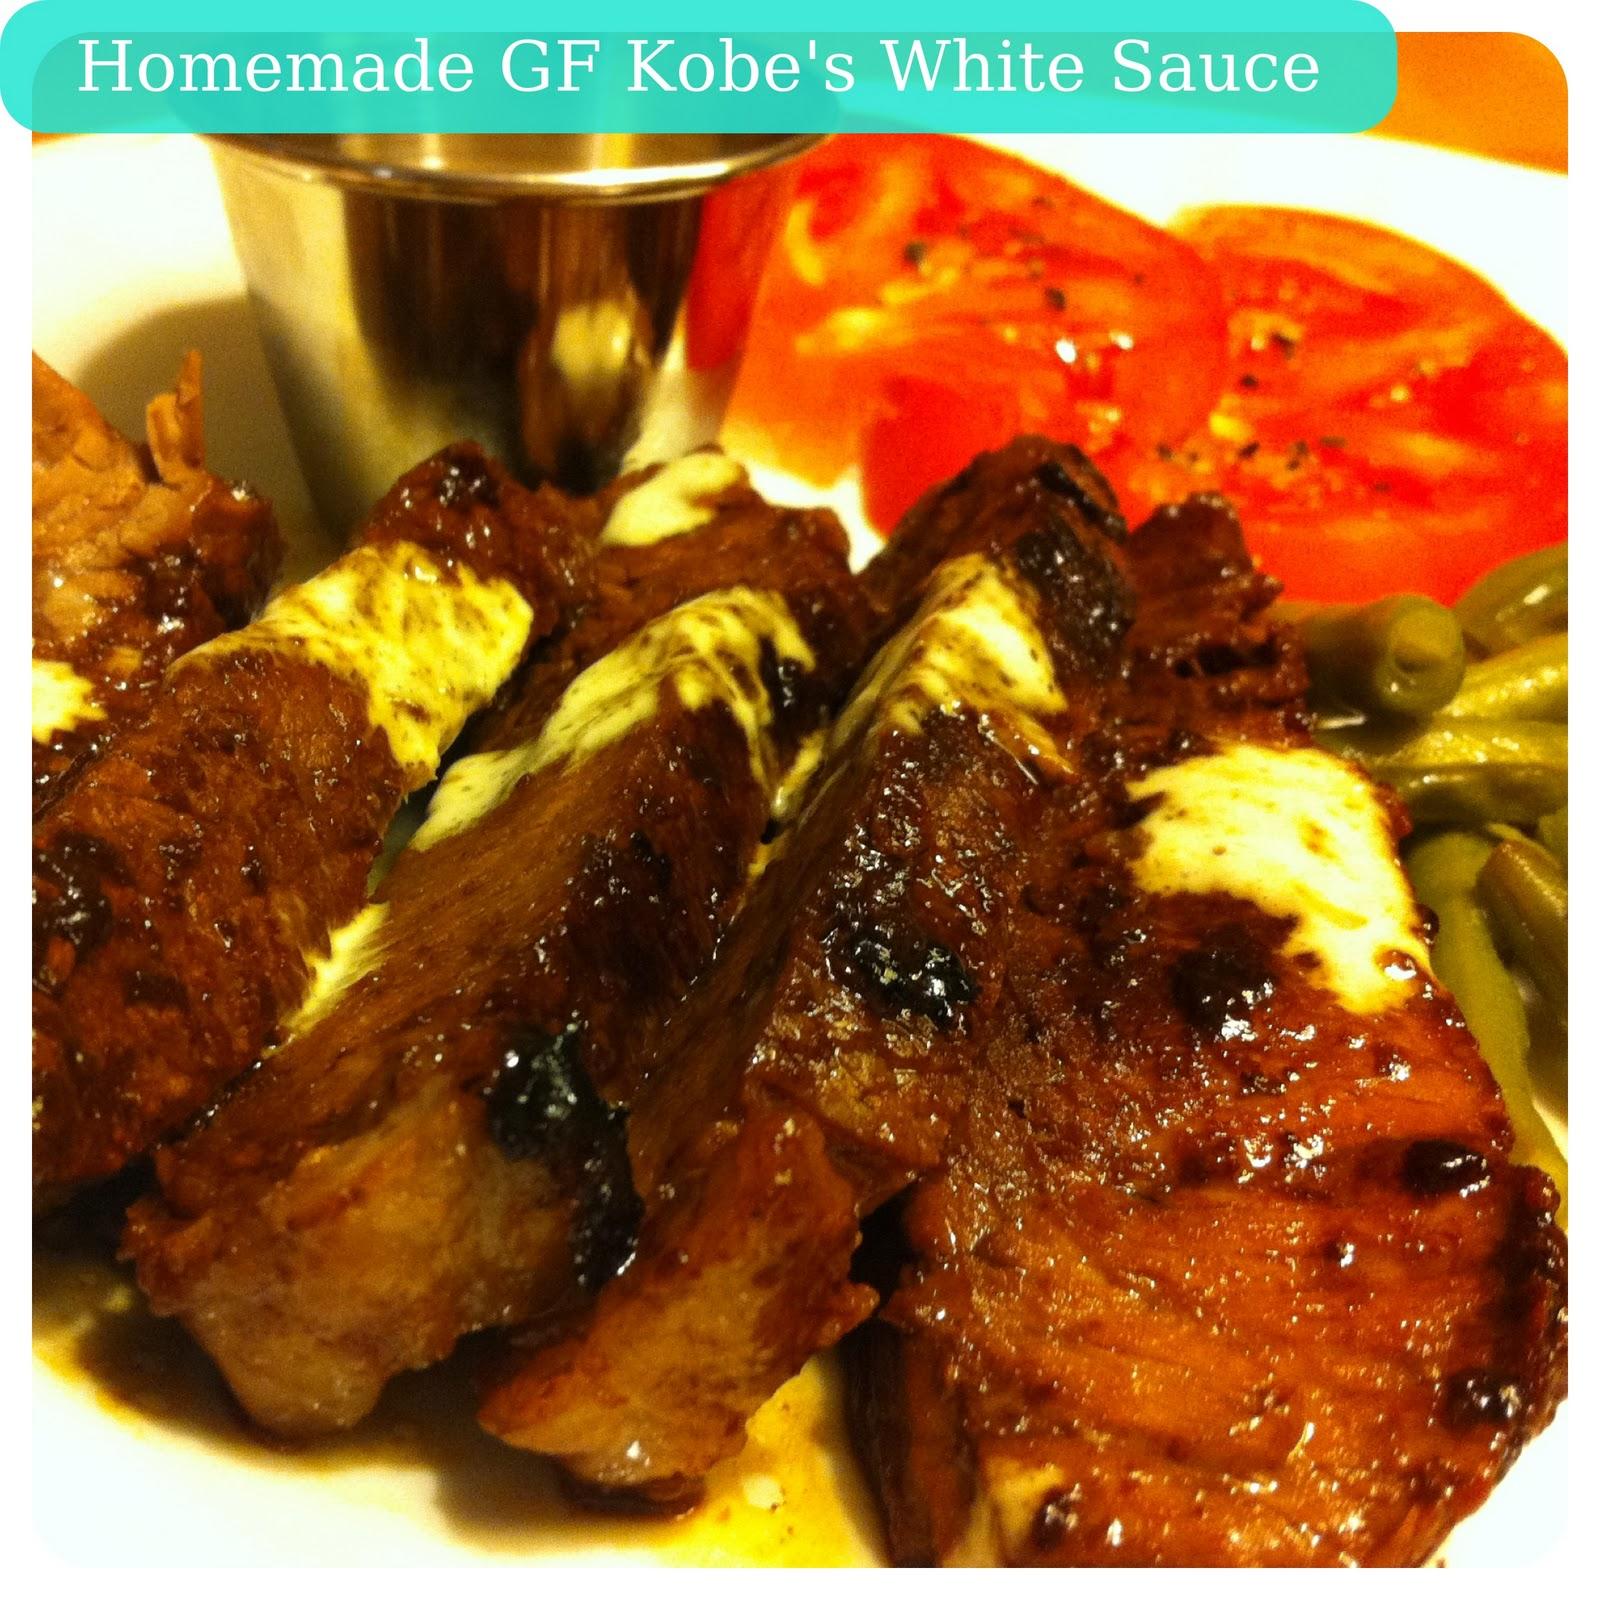 Gluten Free Booty: Gluten Free - Kobe's Steak House - White Sauce